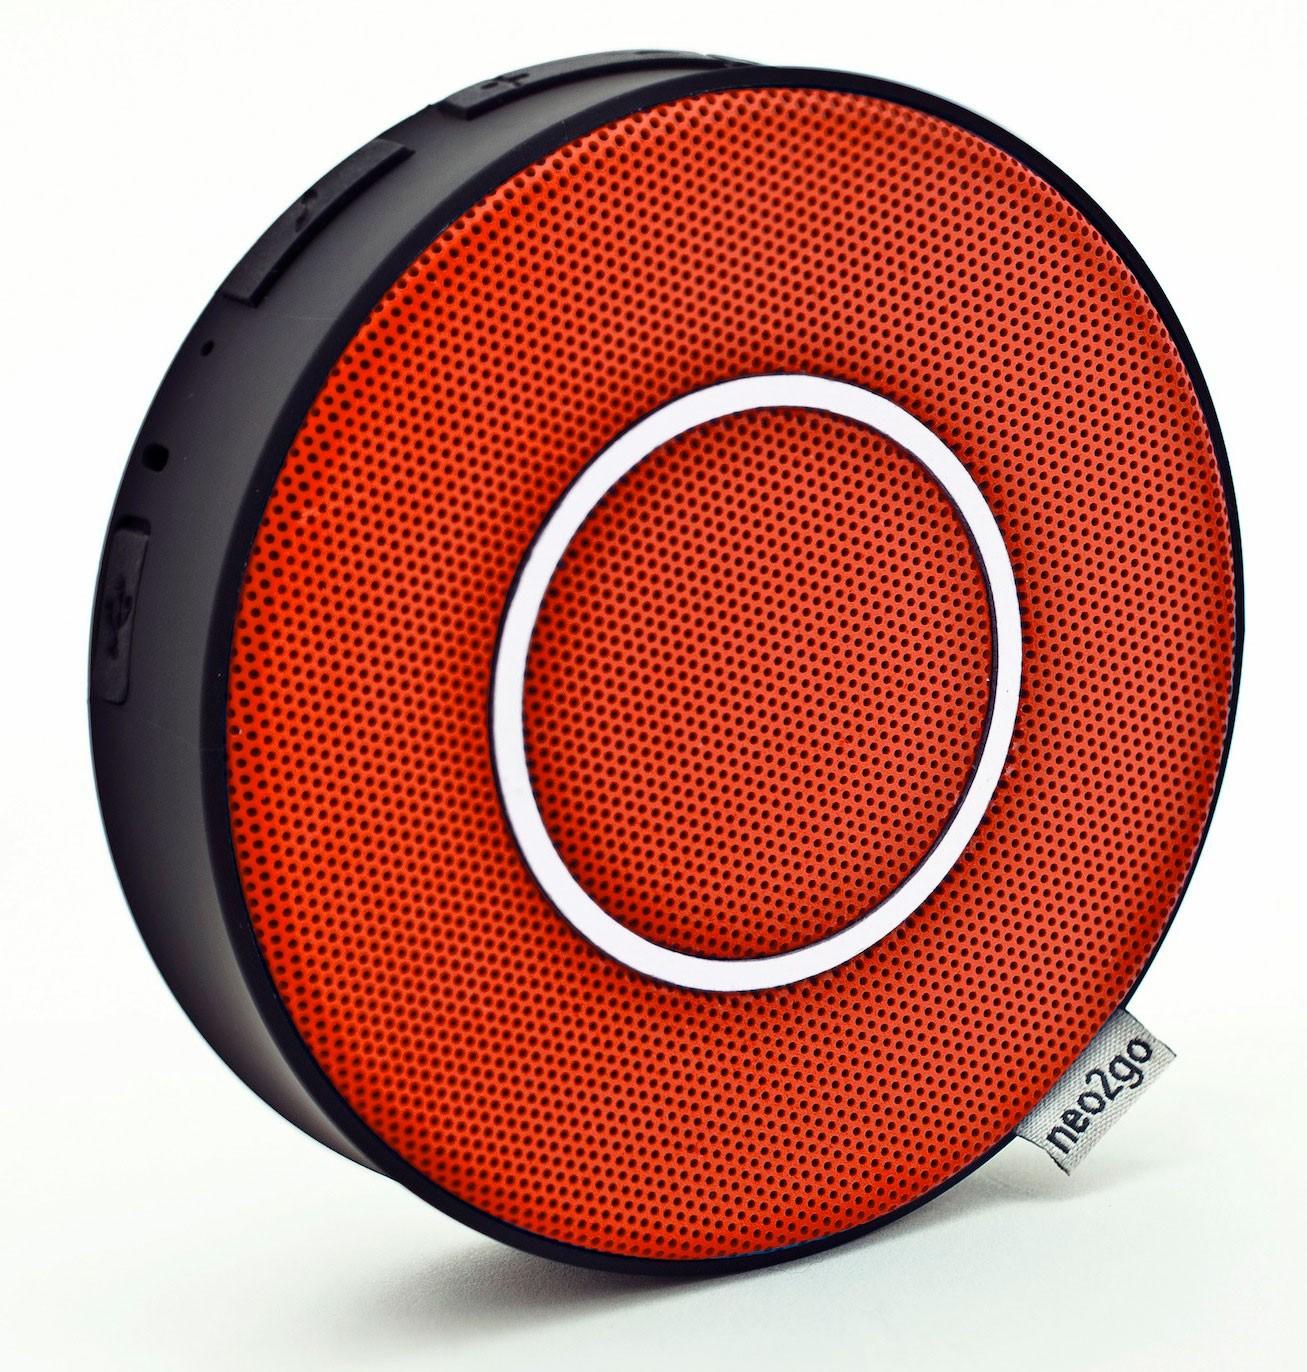 Enceinte Bluetooth Salle De Bain  Bright Shadow Online